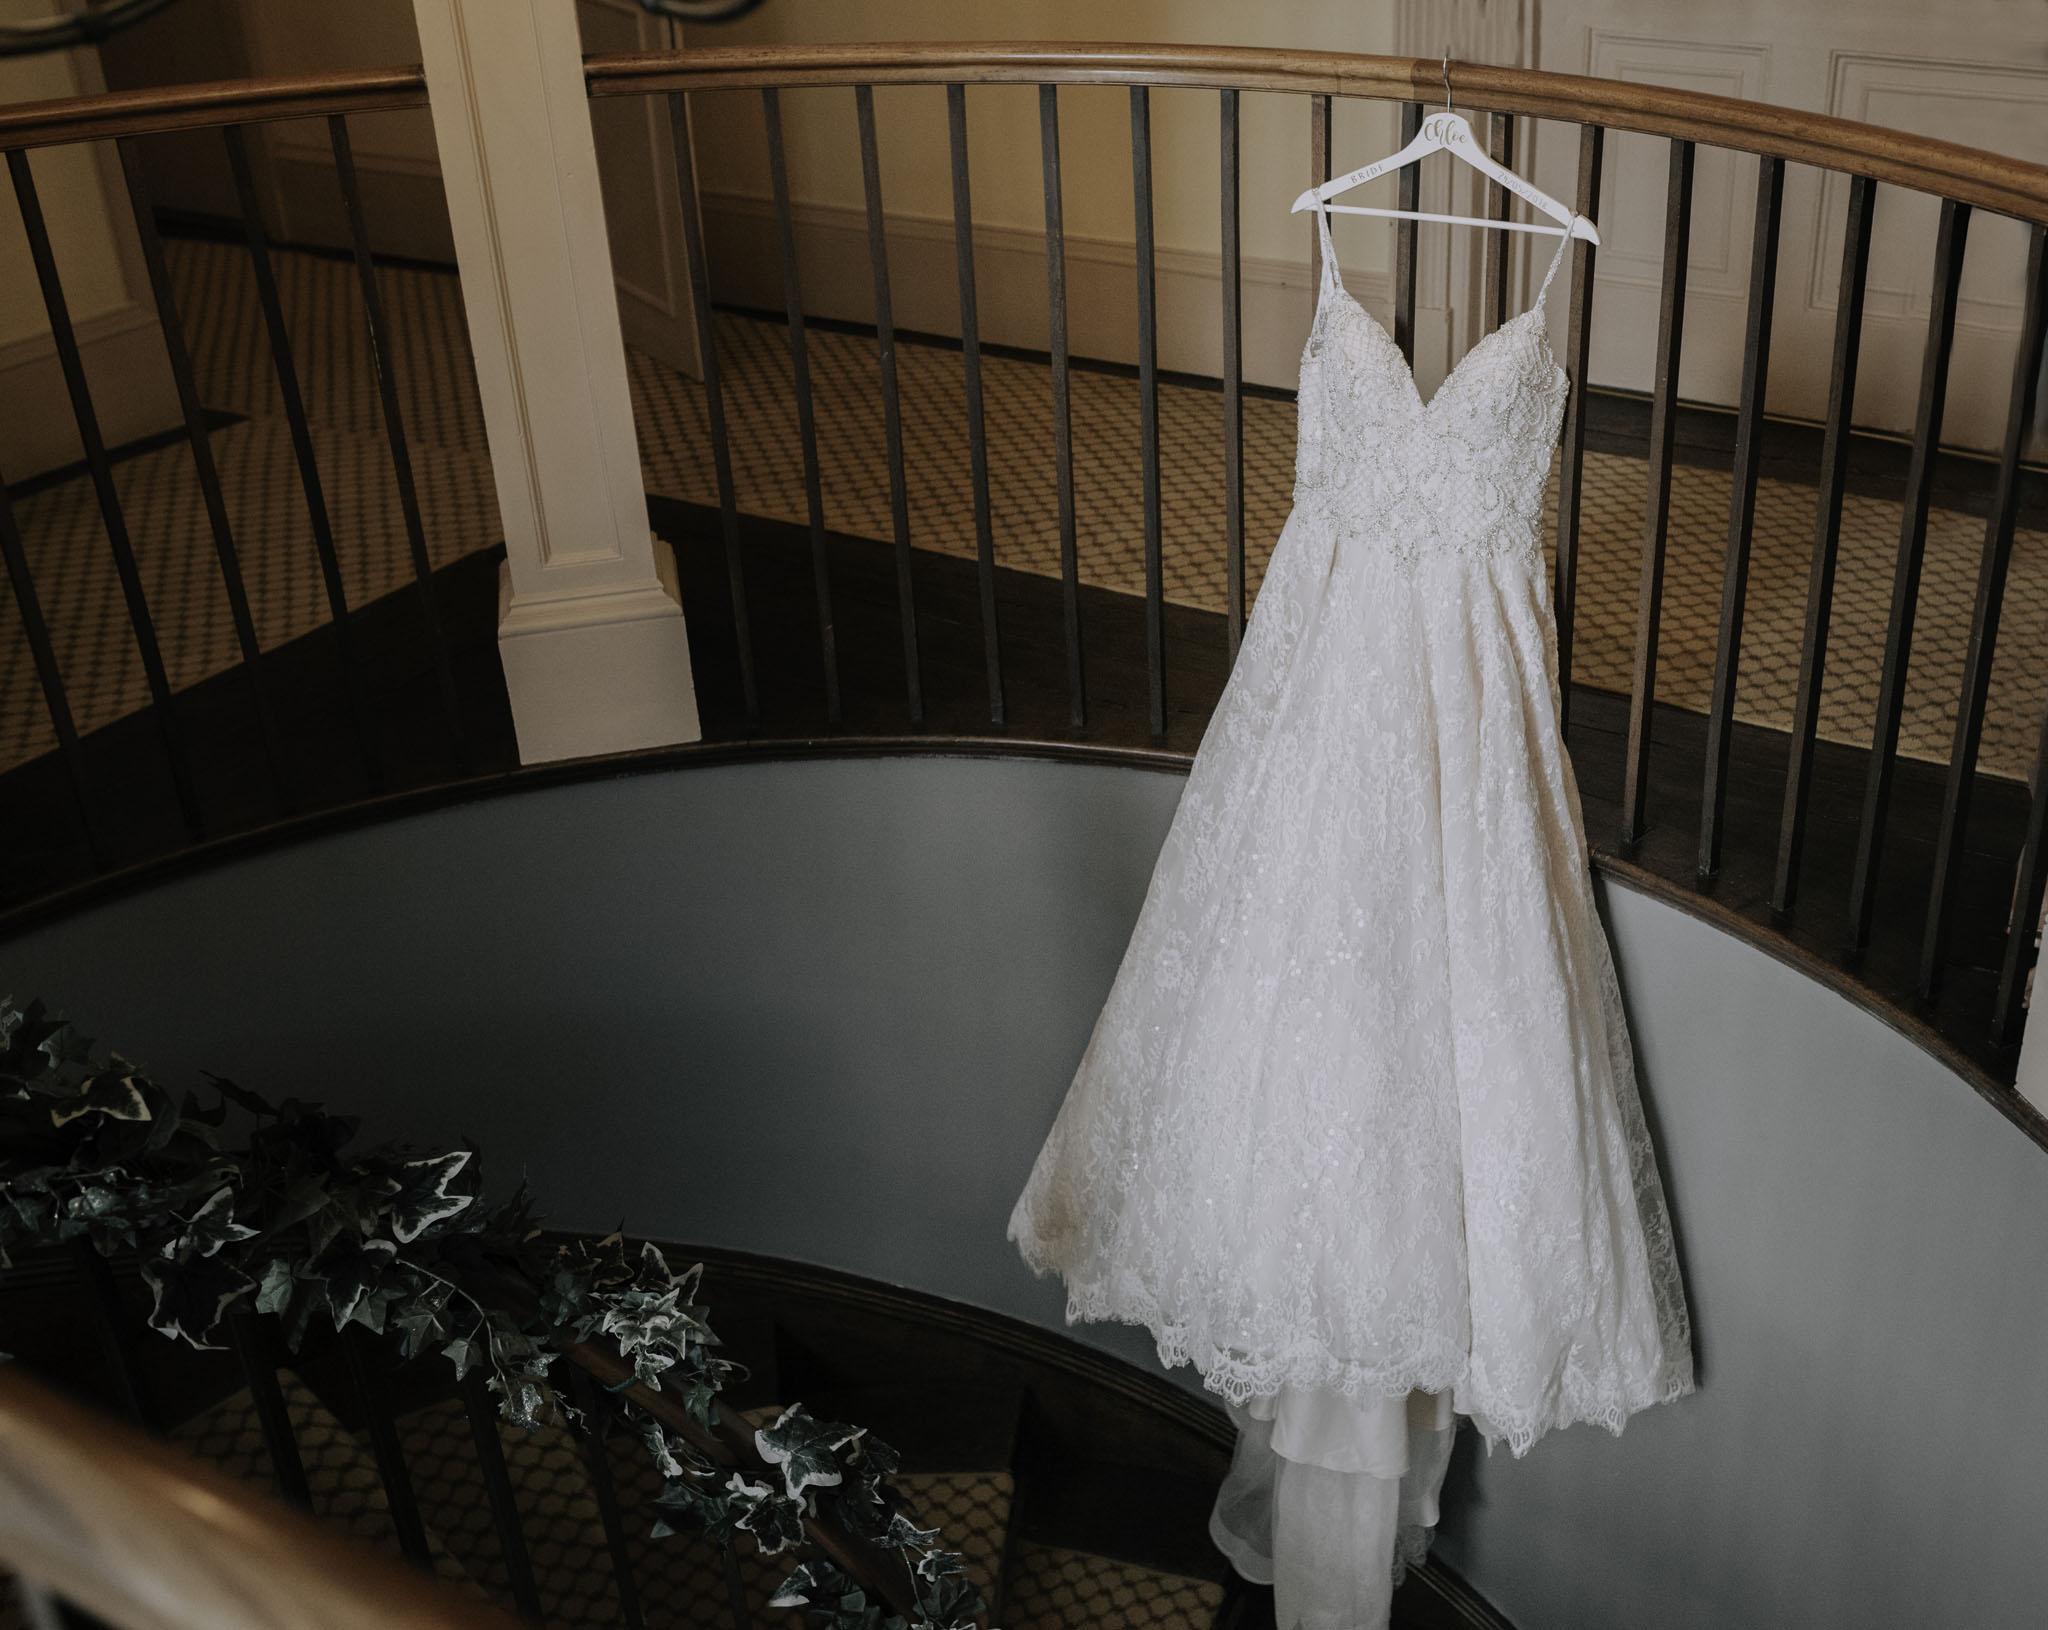 wedding-photographer-glewstone-court-hereford-scott-stockwell-photography005.jpg